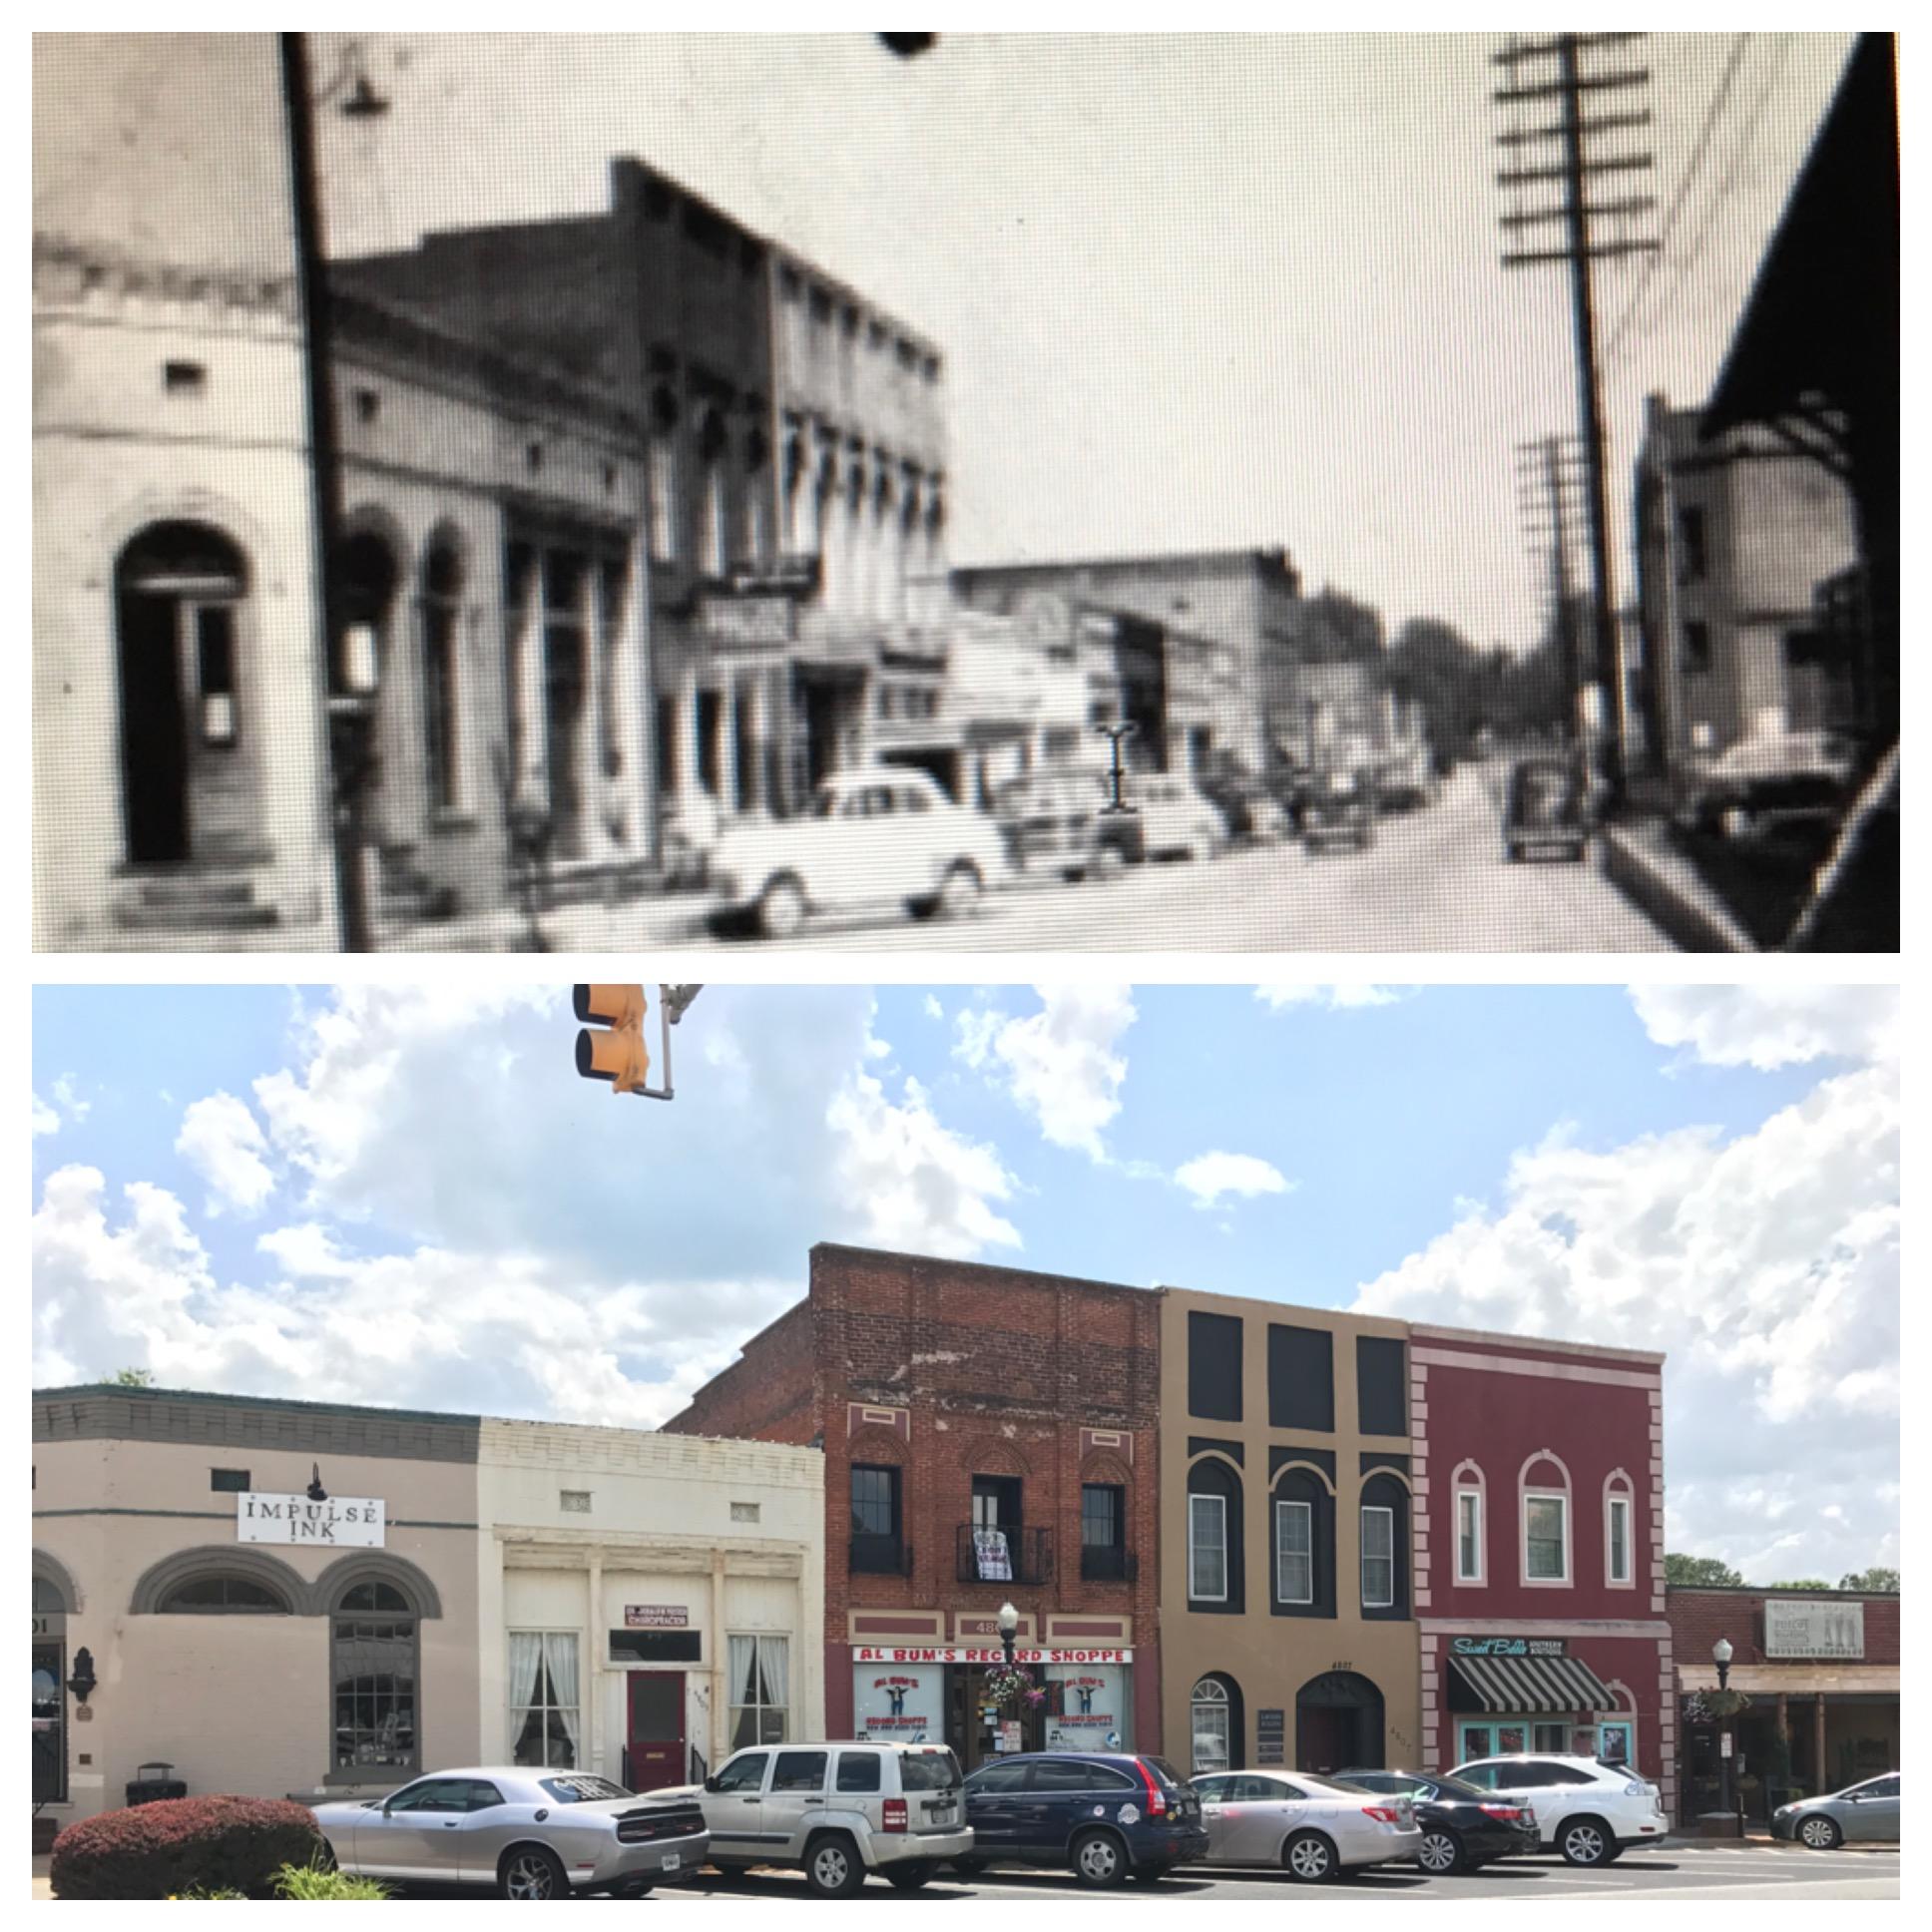 A comparison of an earlier photo taken along N. Main Street versus today.